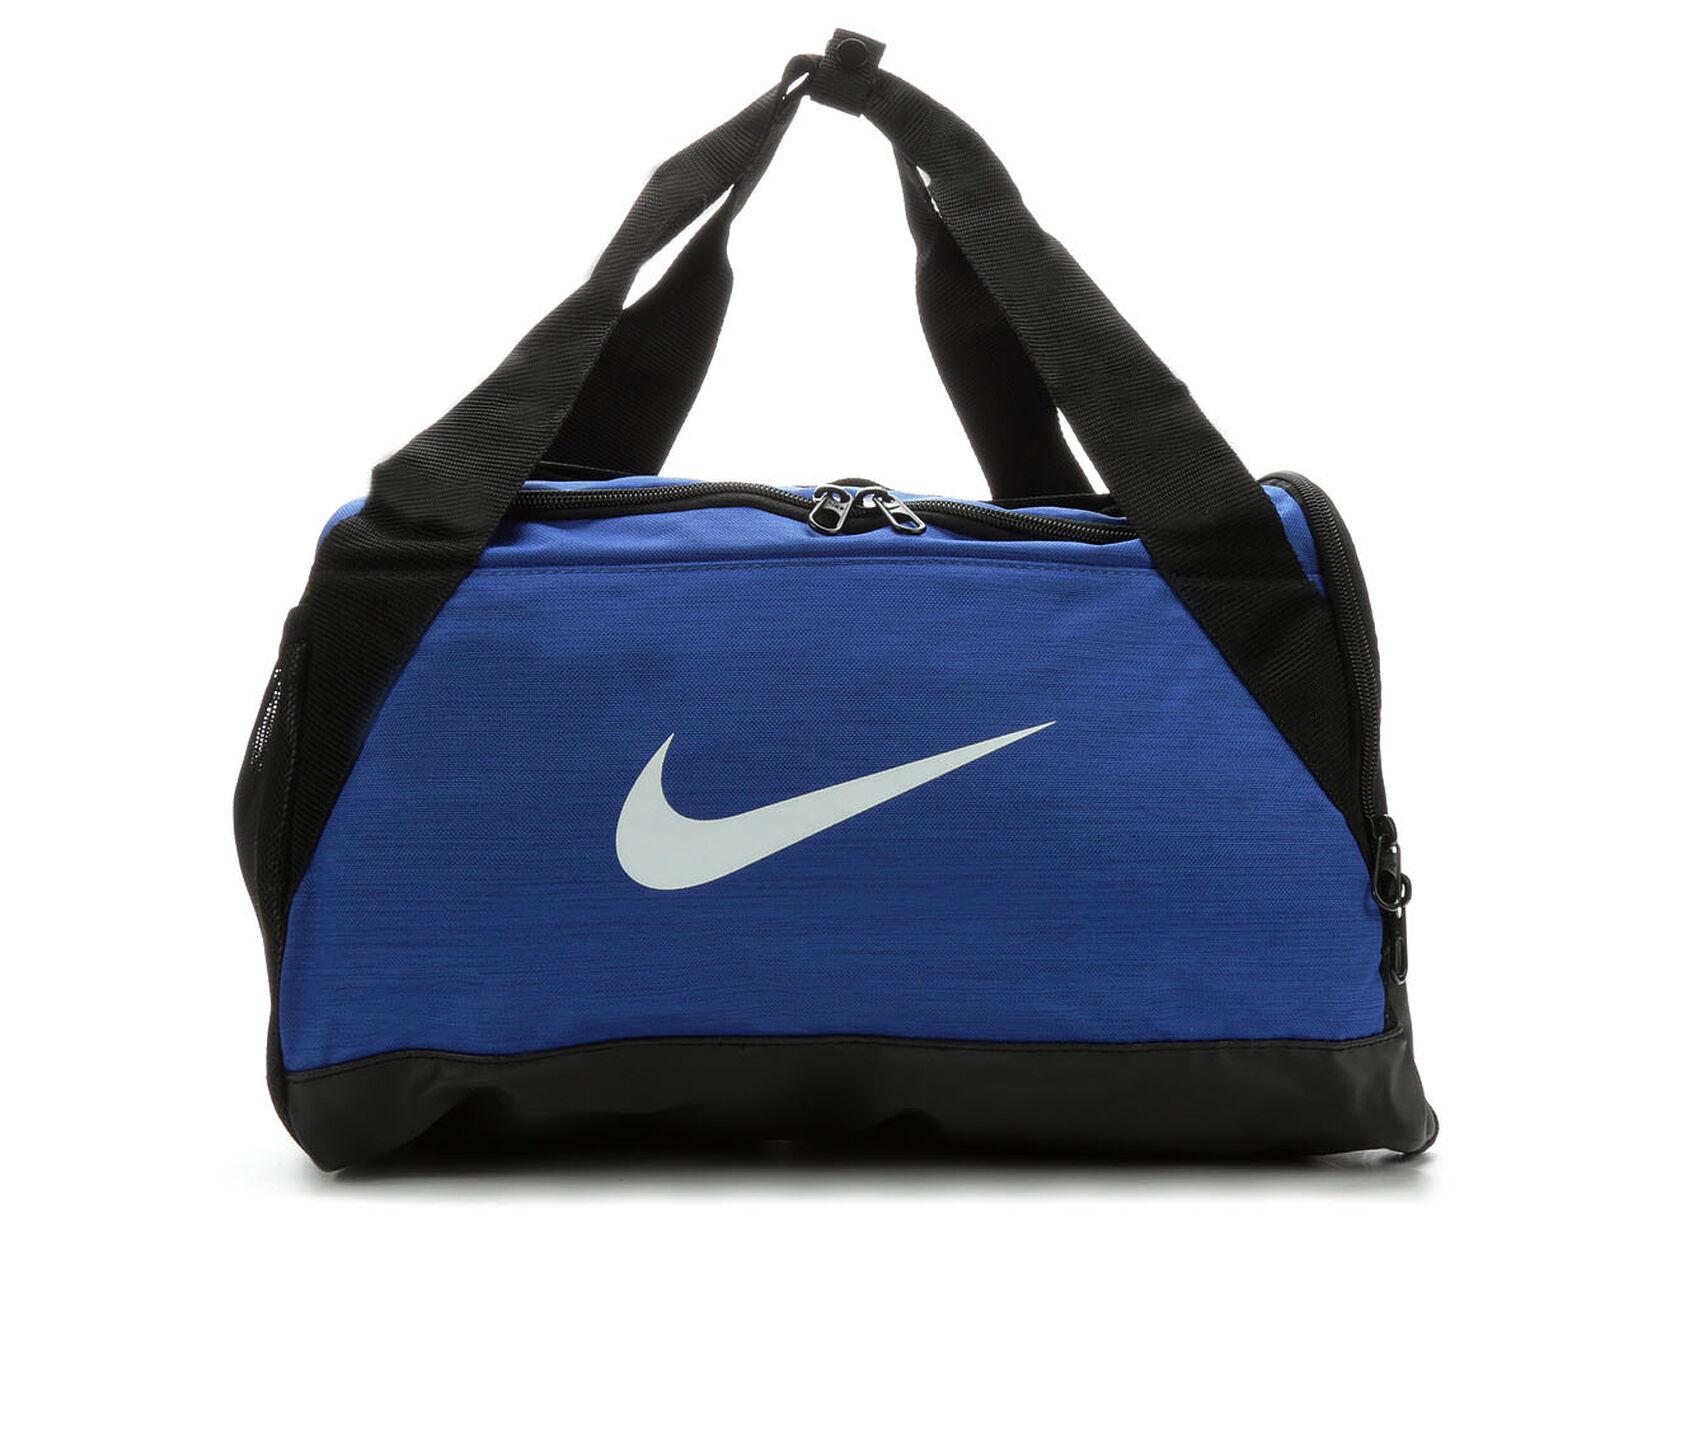 71a205a58c8cdc Nike Brasilia Extra Small Duffel Bag   Shoe Carnival